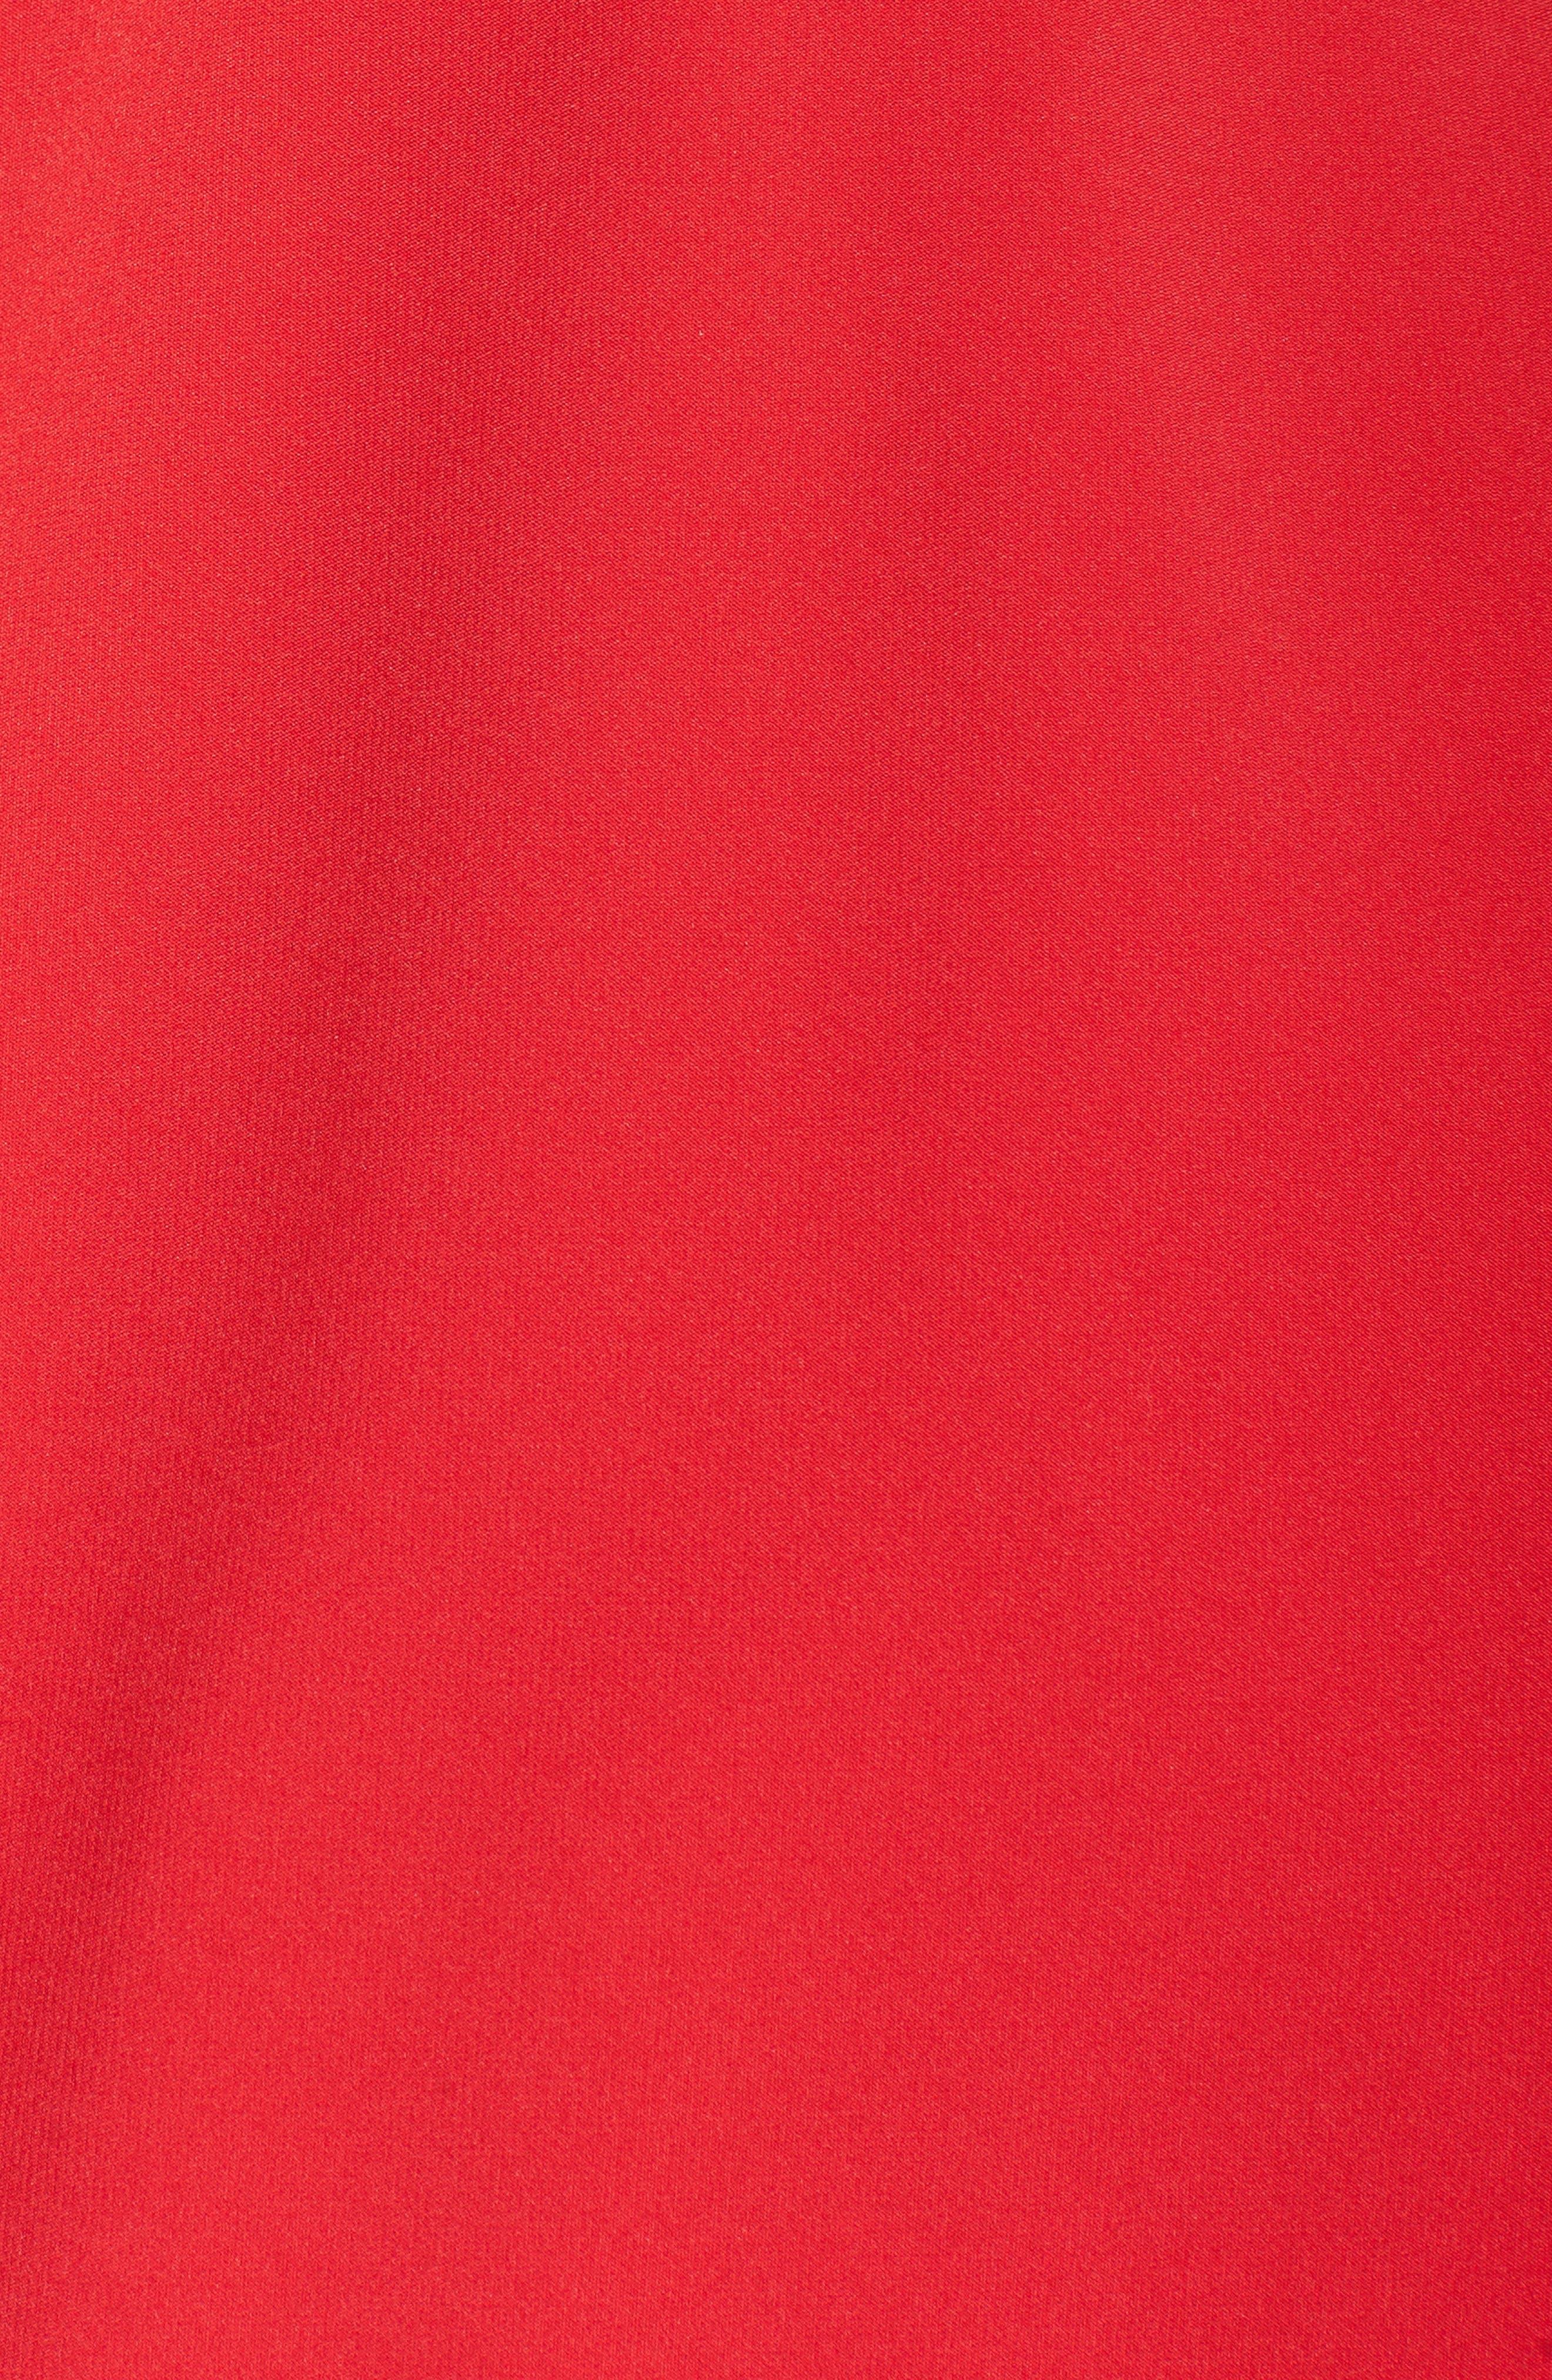 V-Neck Fit & Flare Dress,                             Alternate thumbnail 5, color,                             602